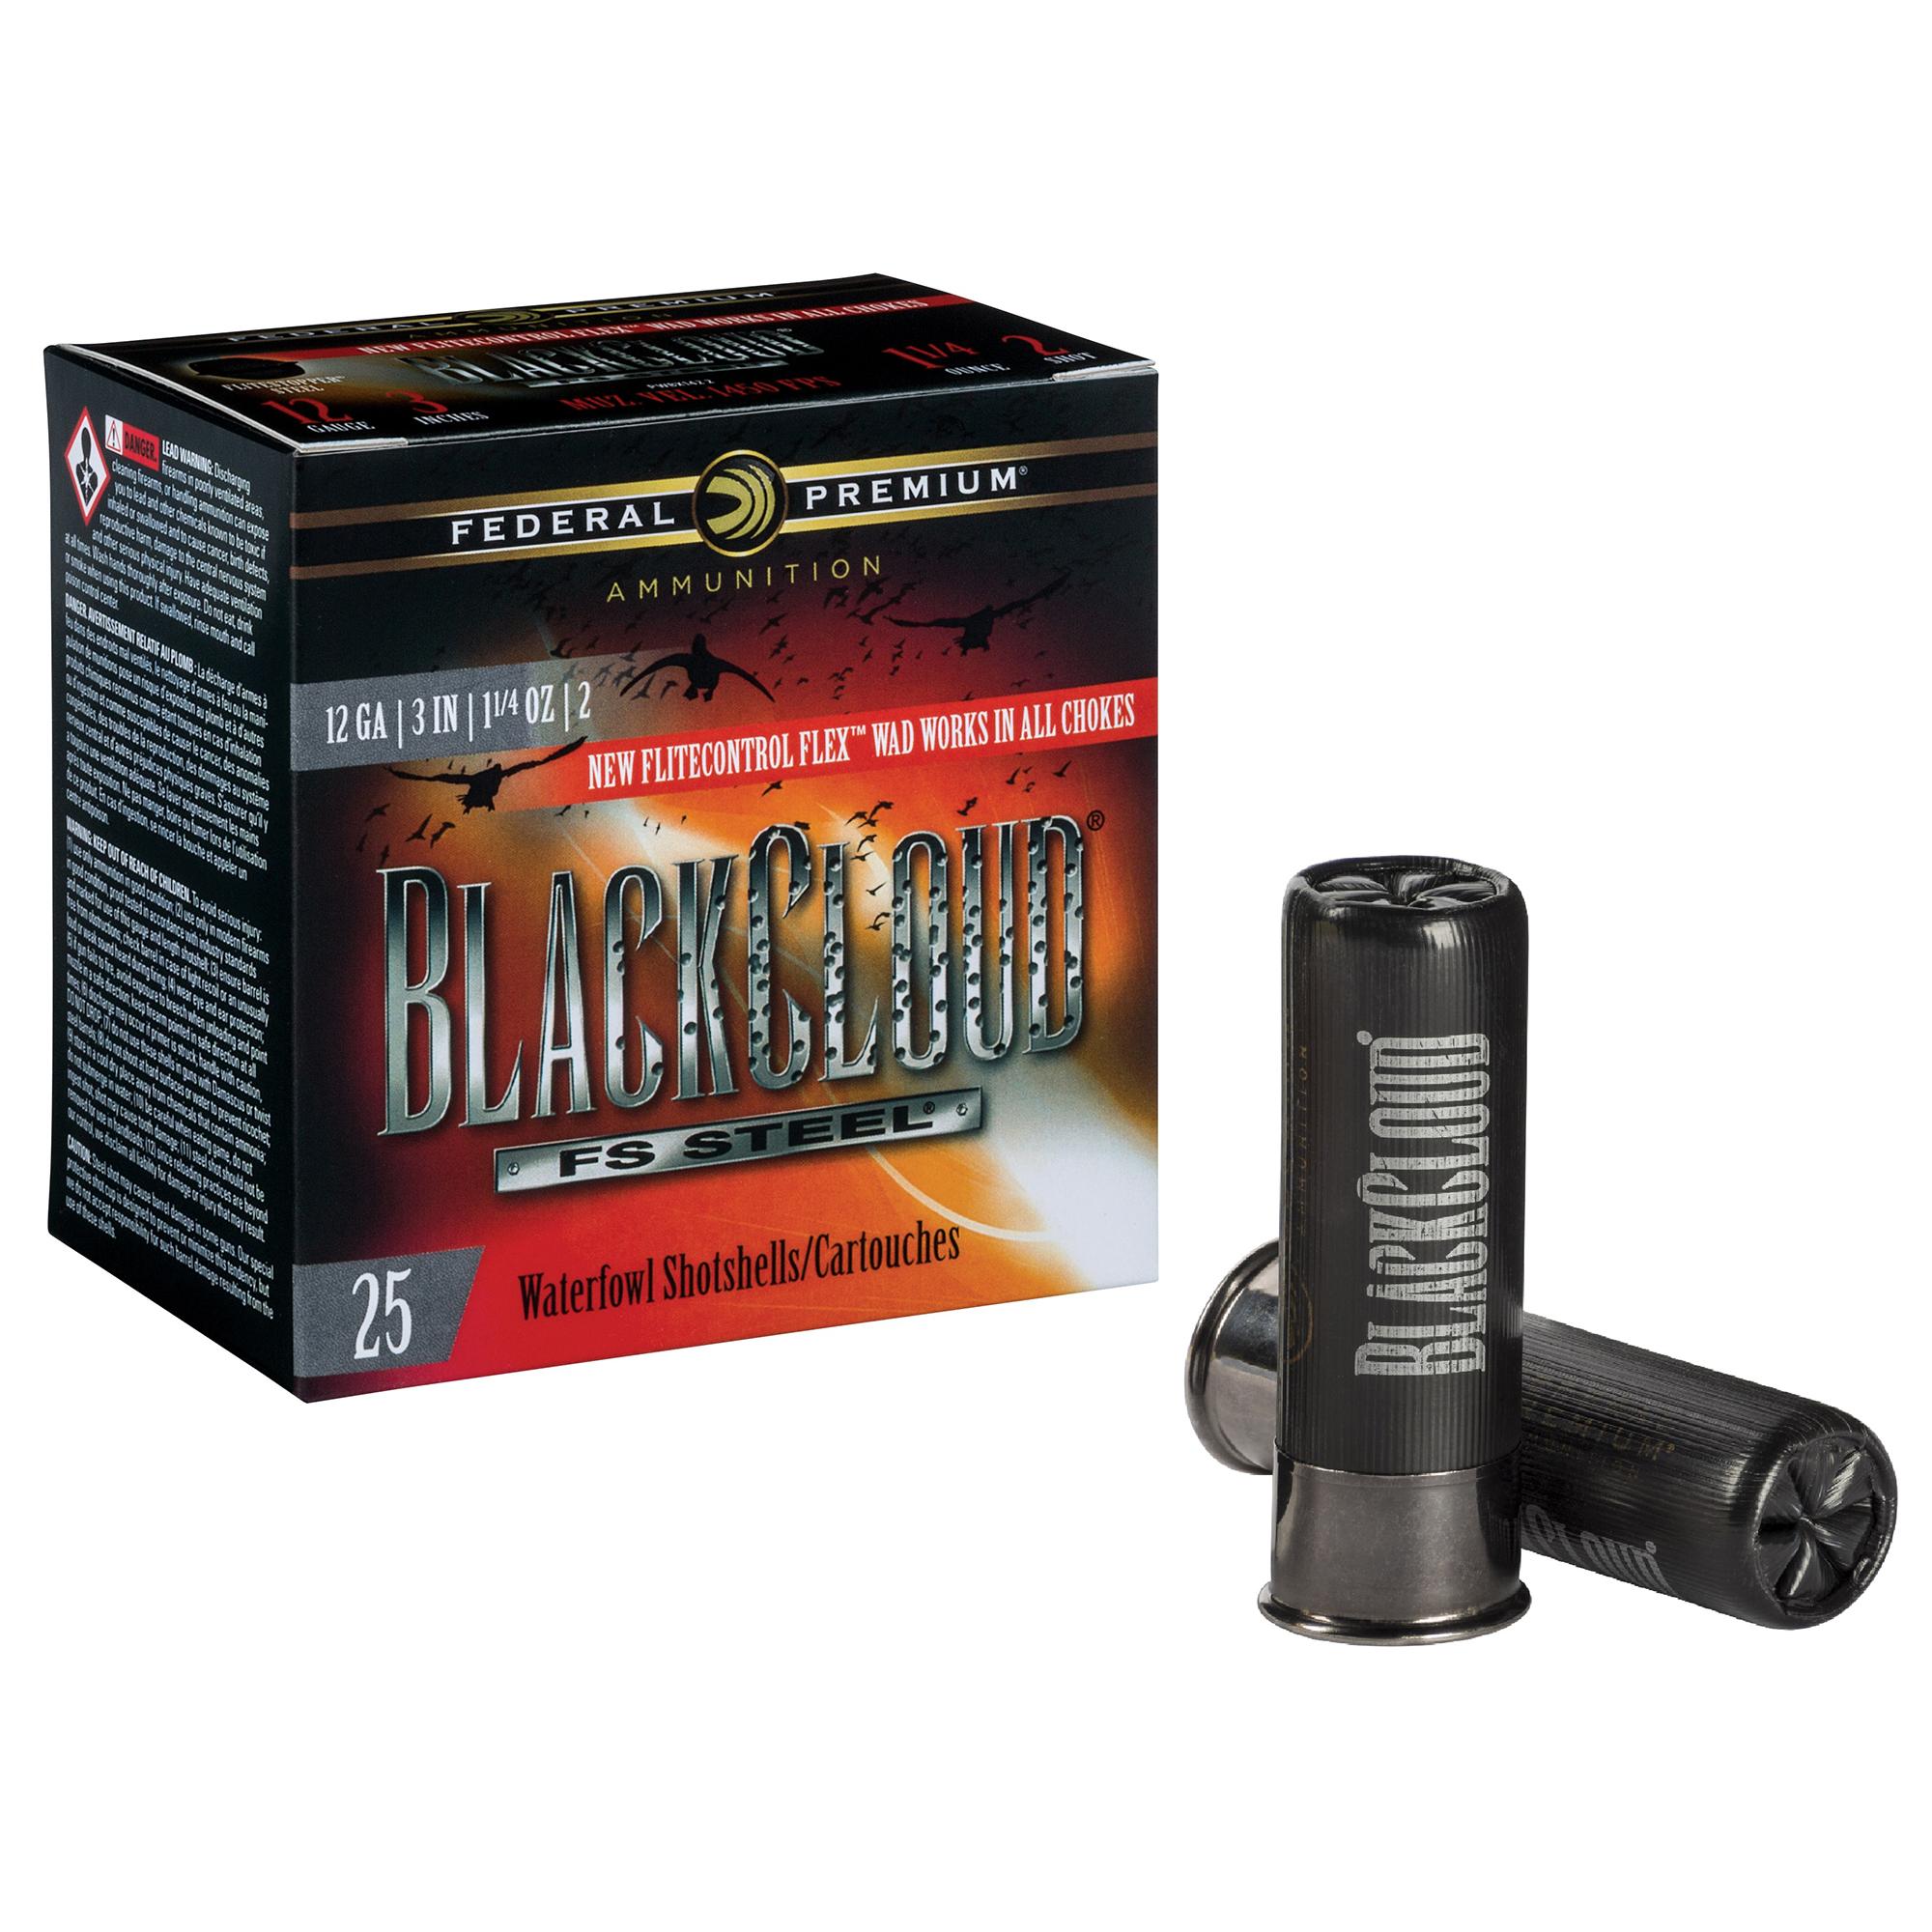 Federal Black Cloud FS Steel Loads, 12-ga, 3″, 1-1/4 oz.